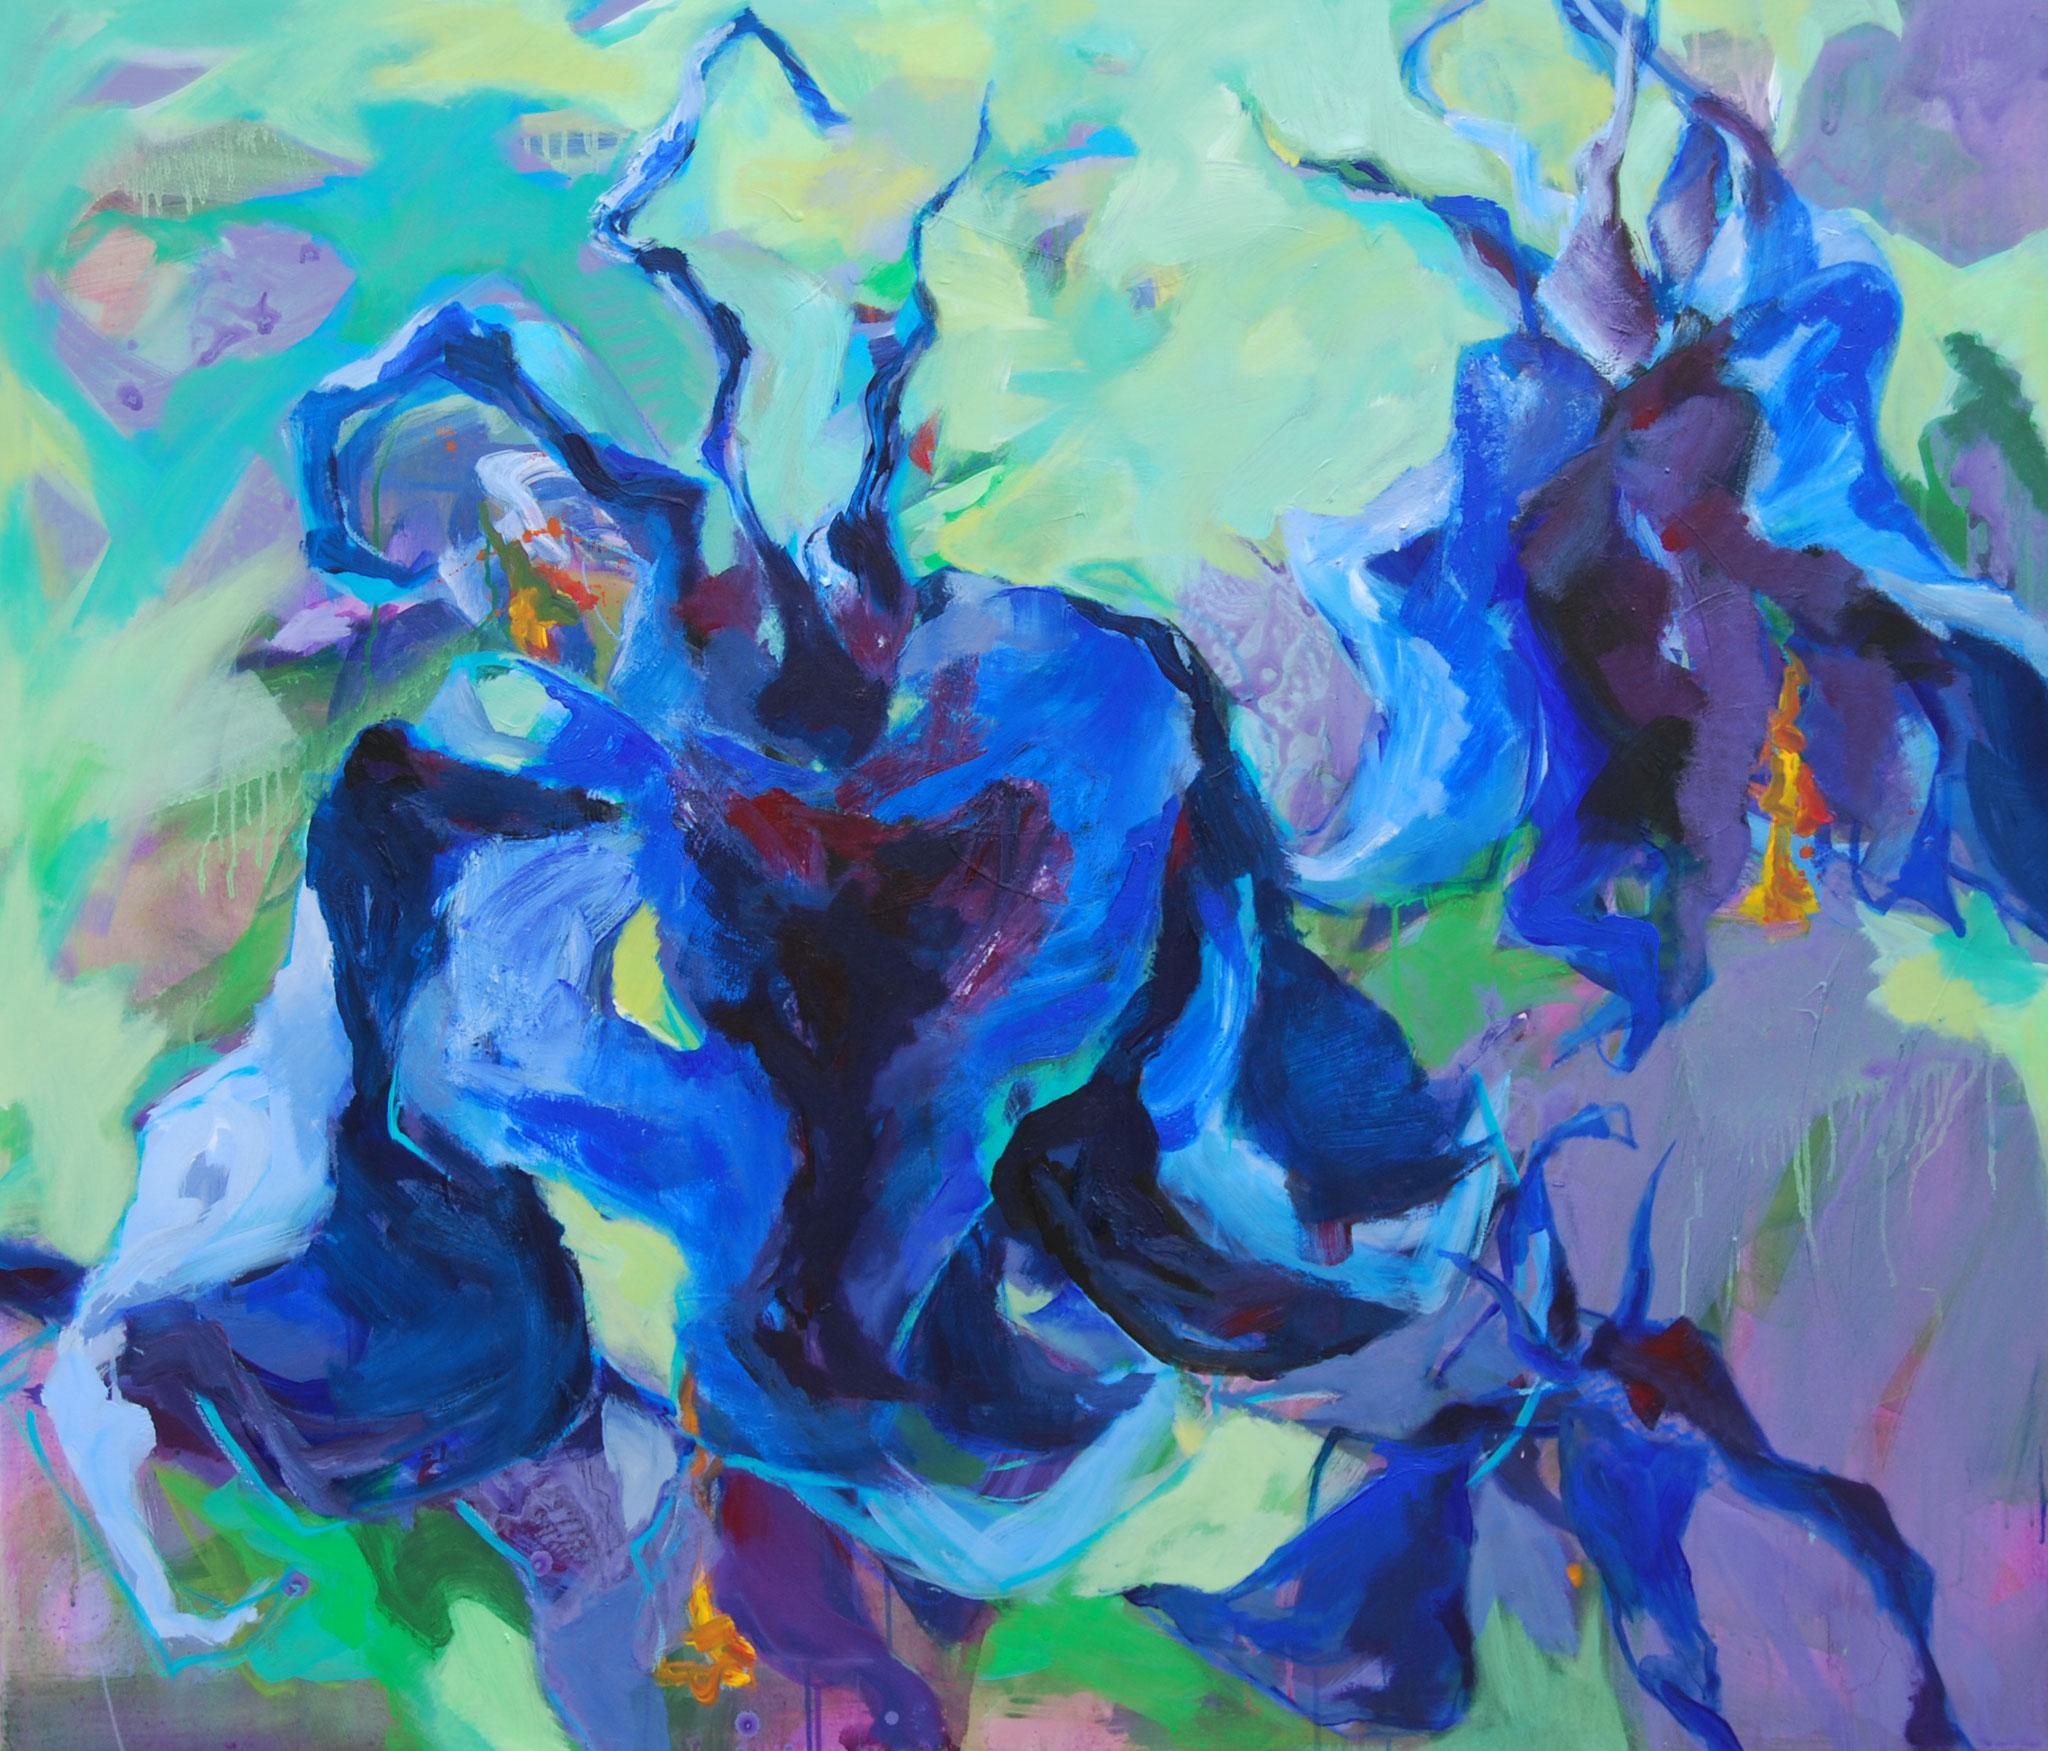 Aquilegias, 2016, Acryl auf Leinwand, 120 x 140 cm,